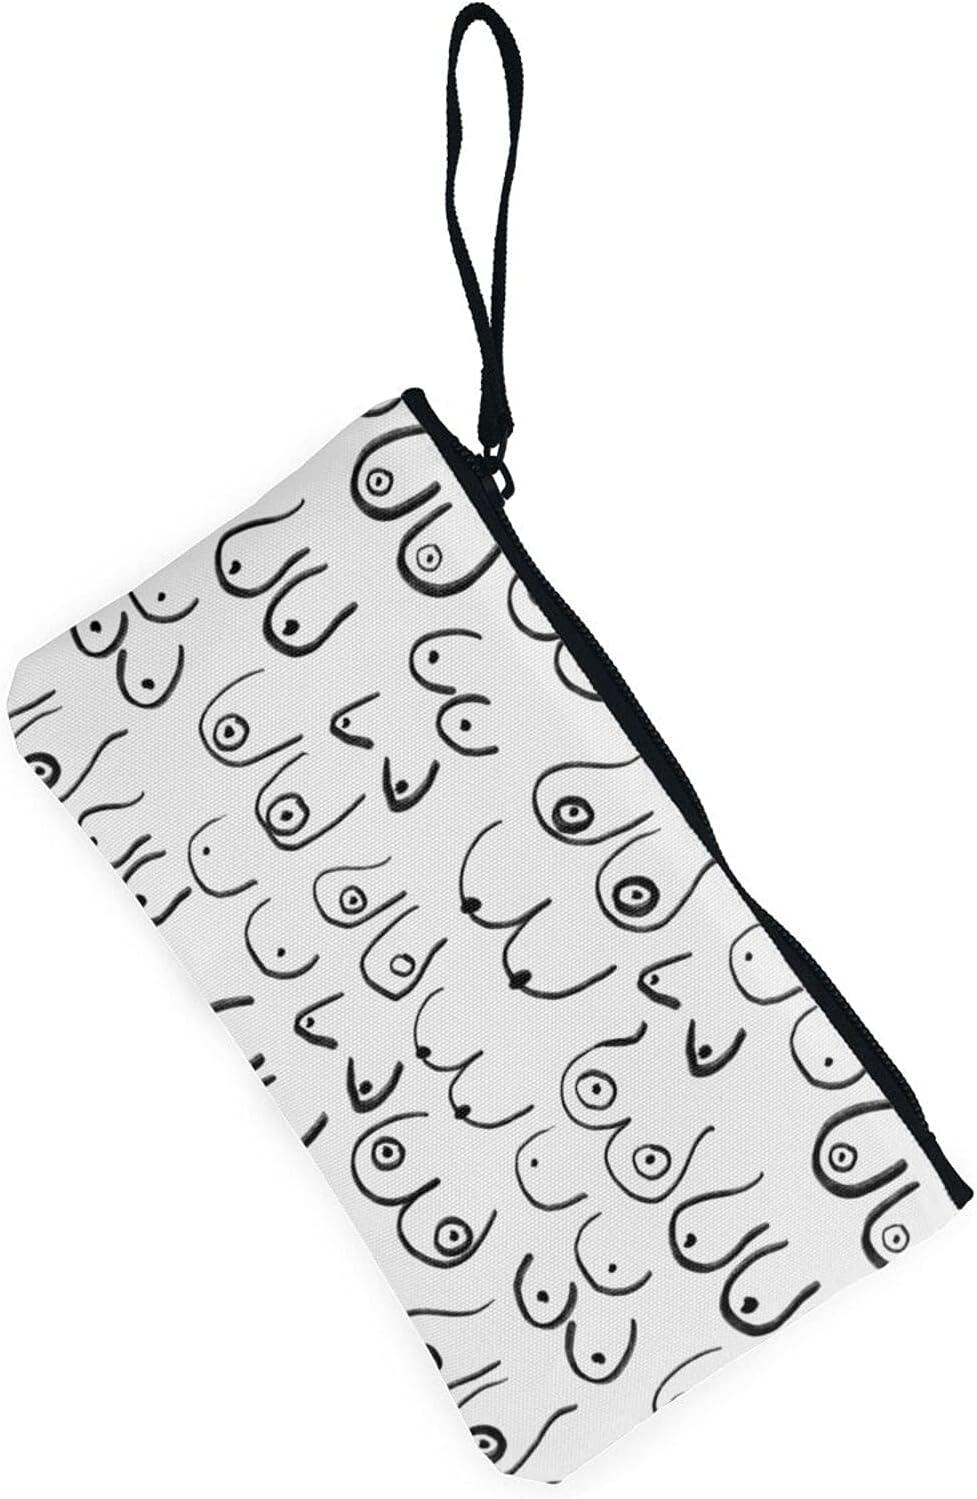 AORRUAM Funny chest Canvas Coin Purse,Canvas Zipper Pencil Cases,Canvas Change Purse Pouch Mini Wallet Coin Bag